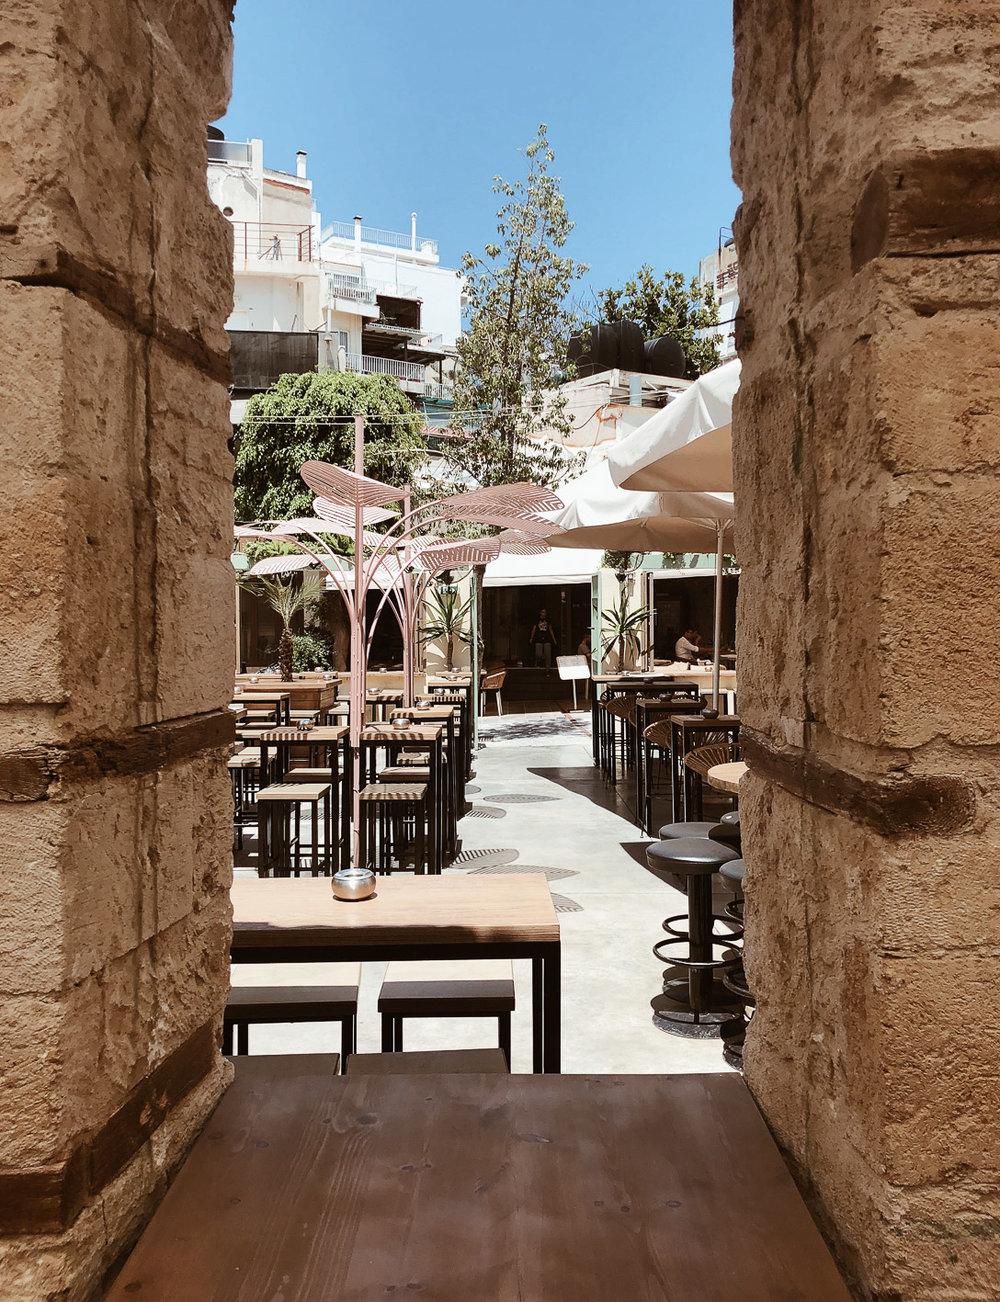 Little-boho-blog-crete-heraklion-open-bar10.jpg